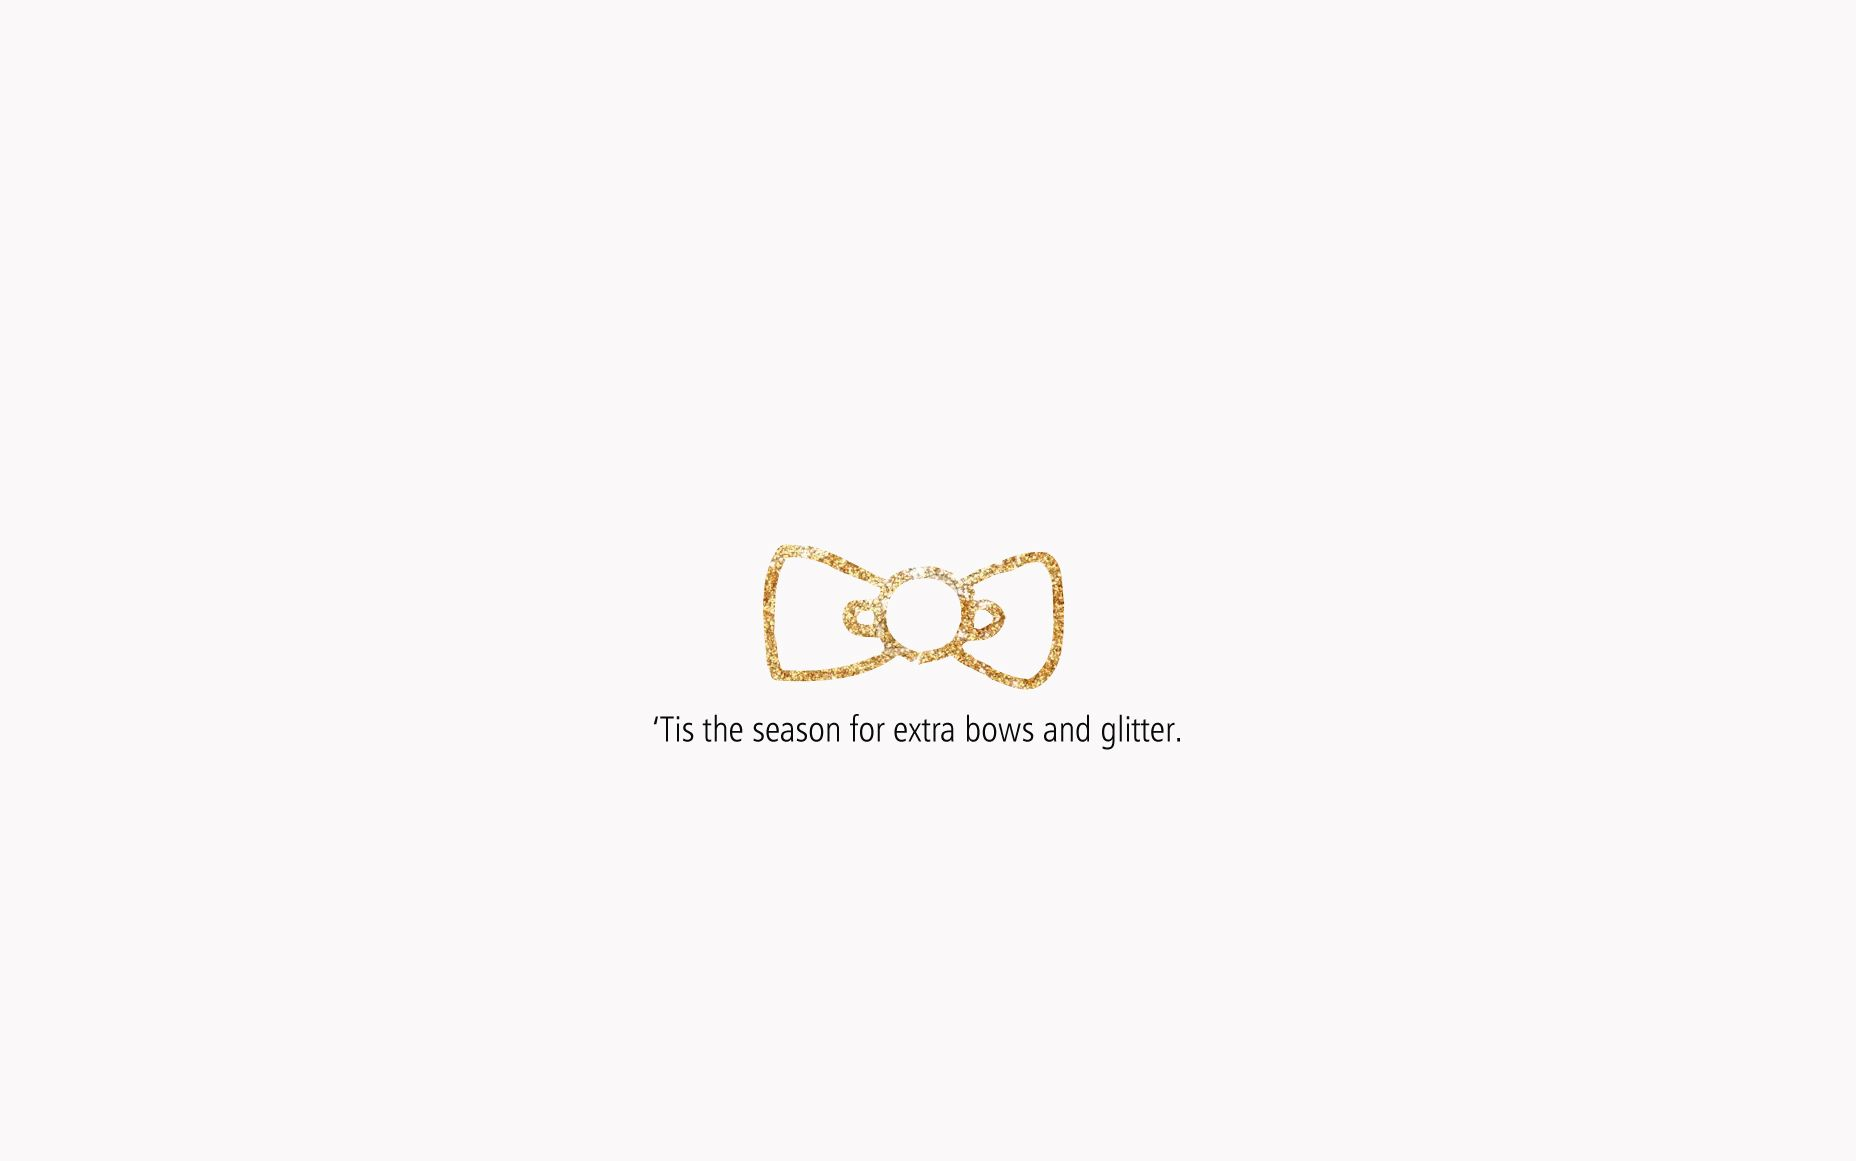 3840x2400 desktop wallpaper gold sparkle inspirational kate spade new year